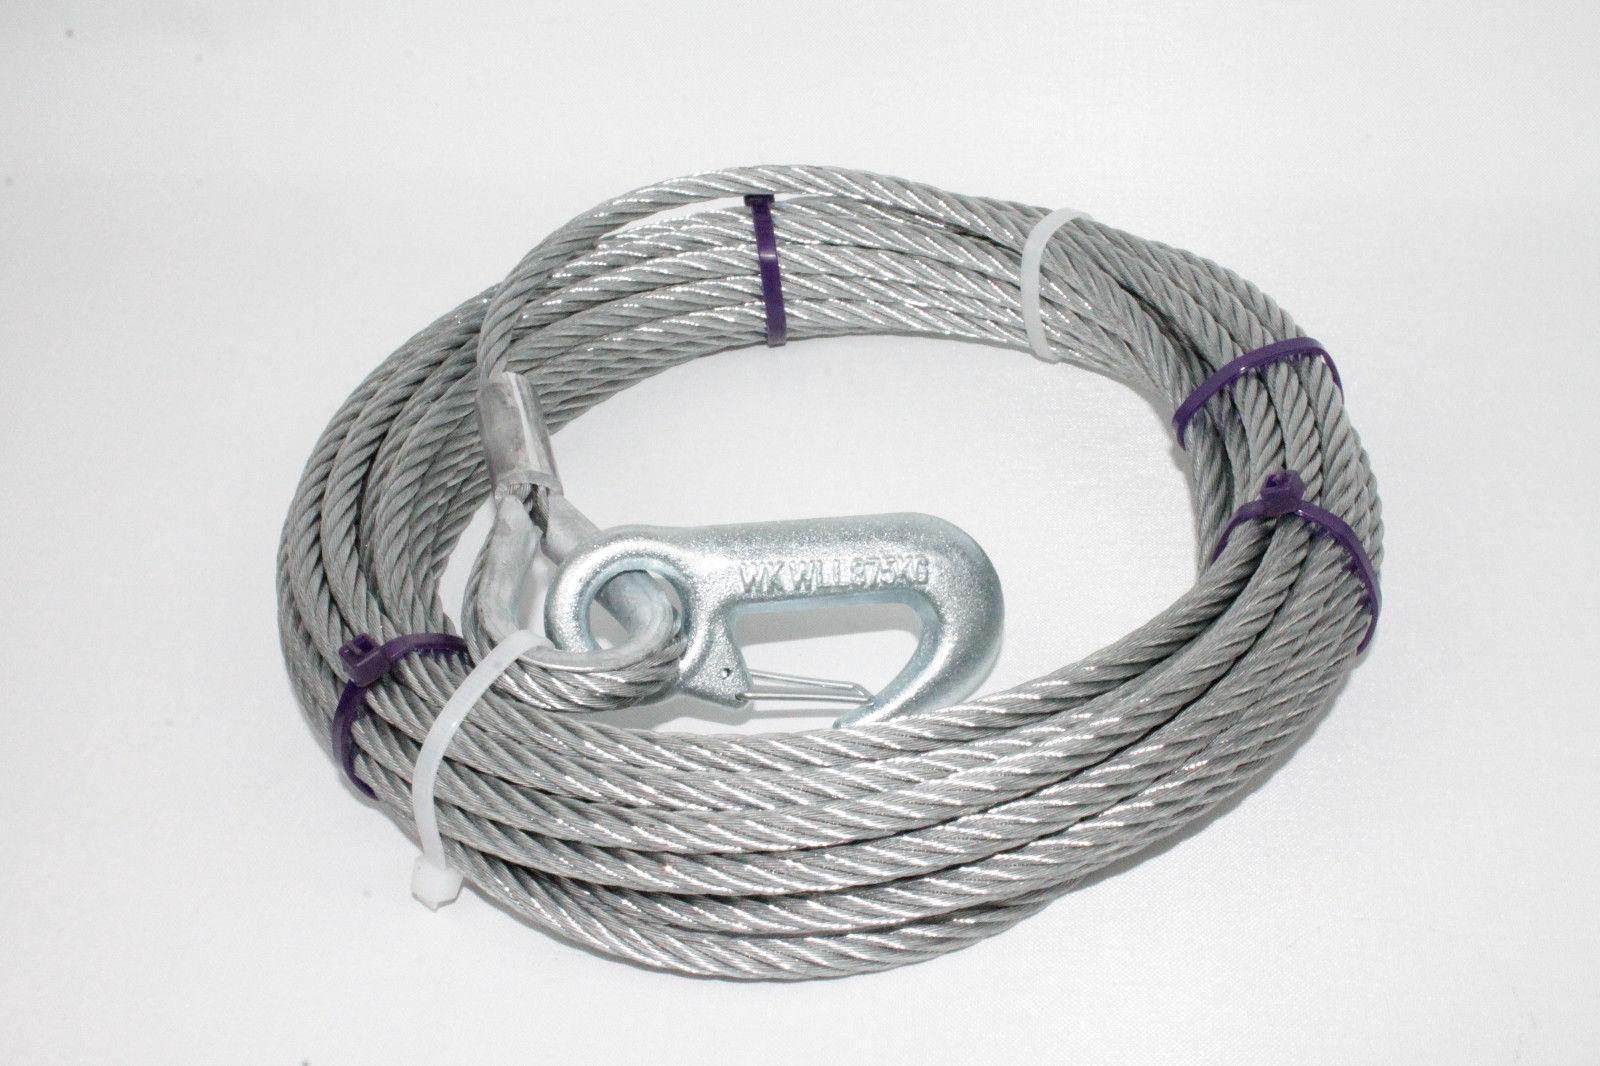 Stahlseil für Seilwinden Drahtseil Seil 12,5m Ø7mm m.Lasthaken DIN12385 L2755.12